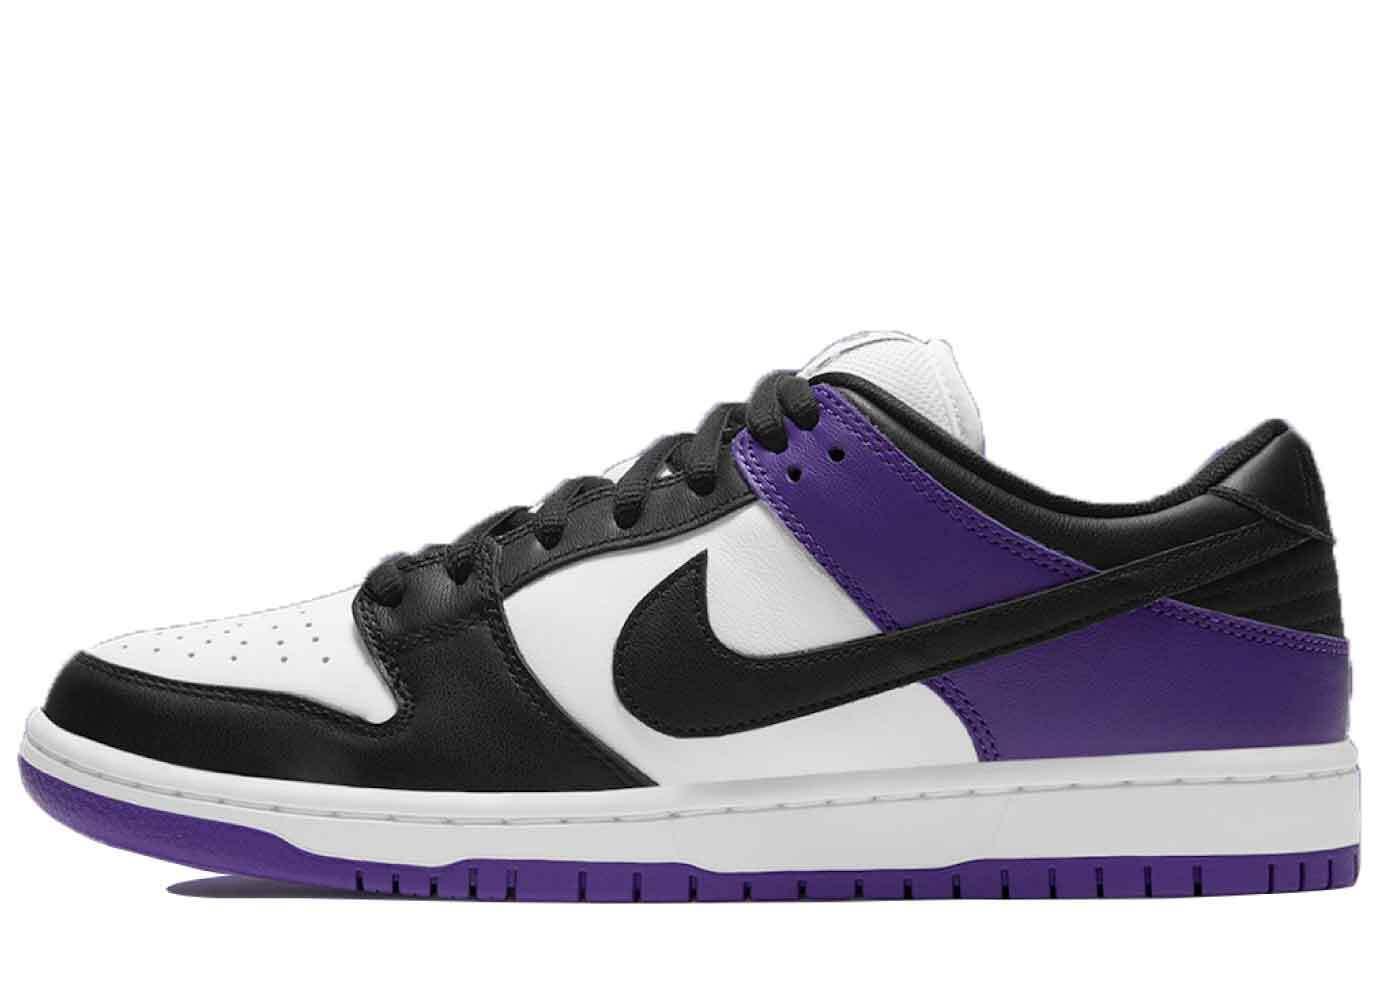 Nike SB Dunk Low Court Purpleの写真